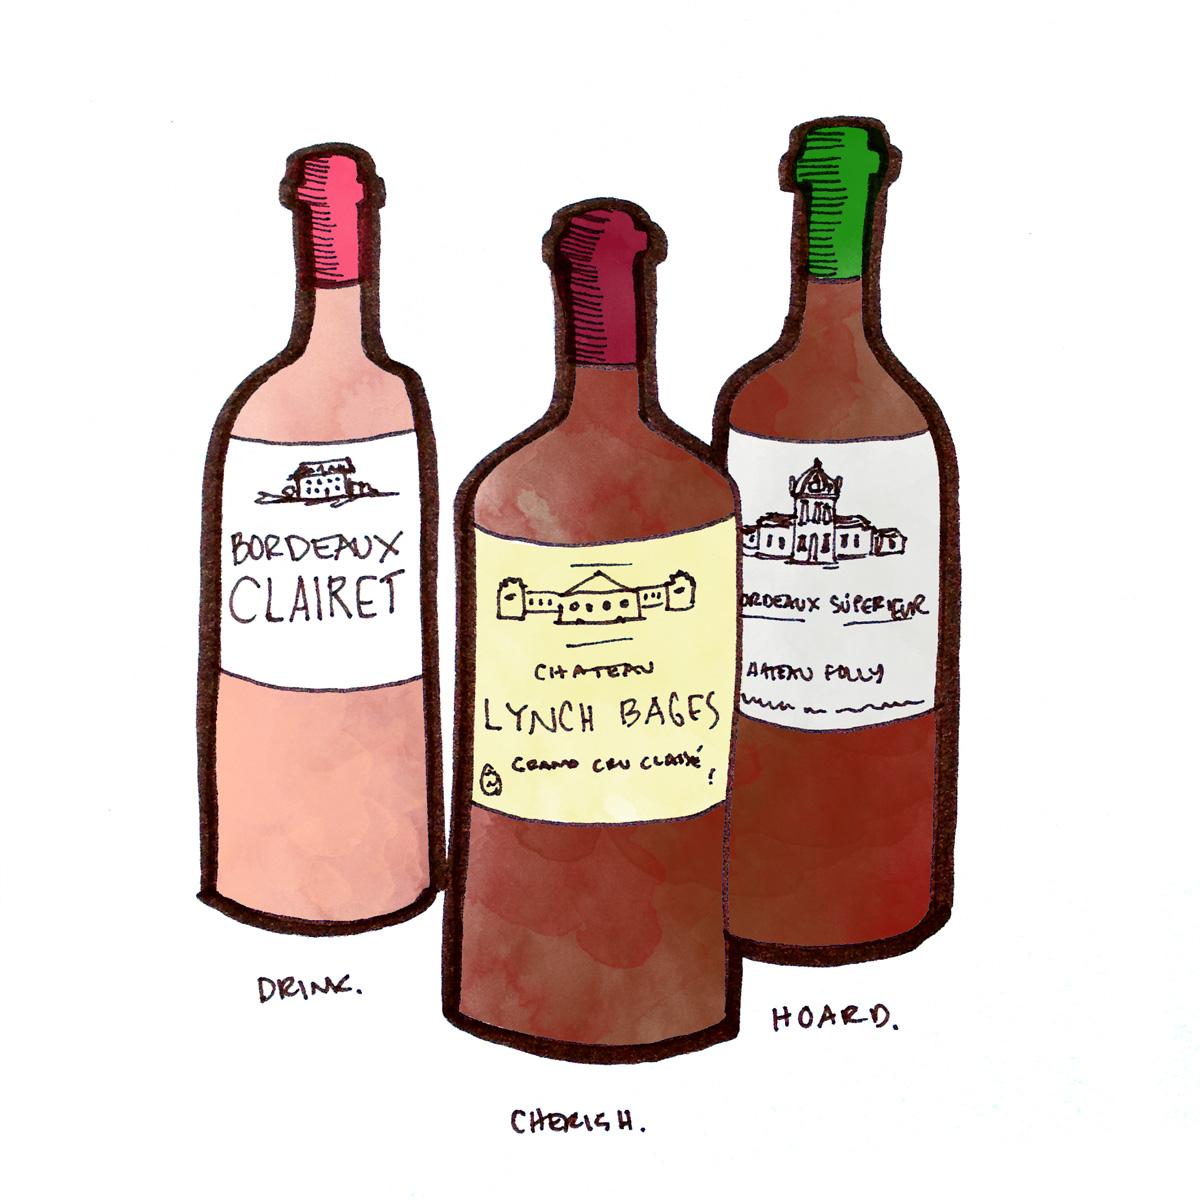 bordeaux-wine-bottles-winefolly-illustration